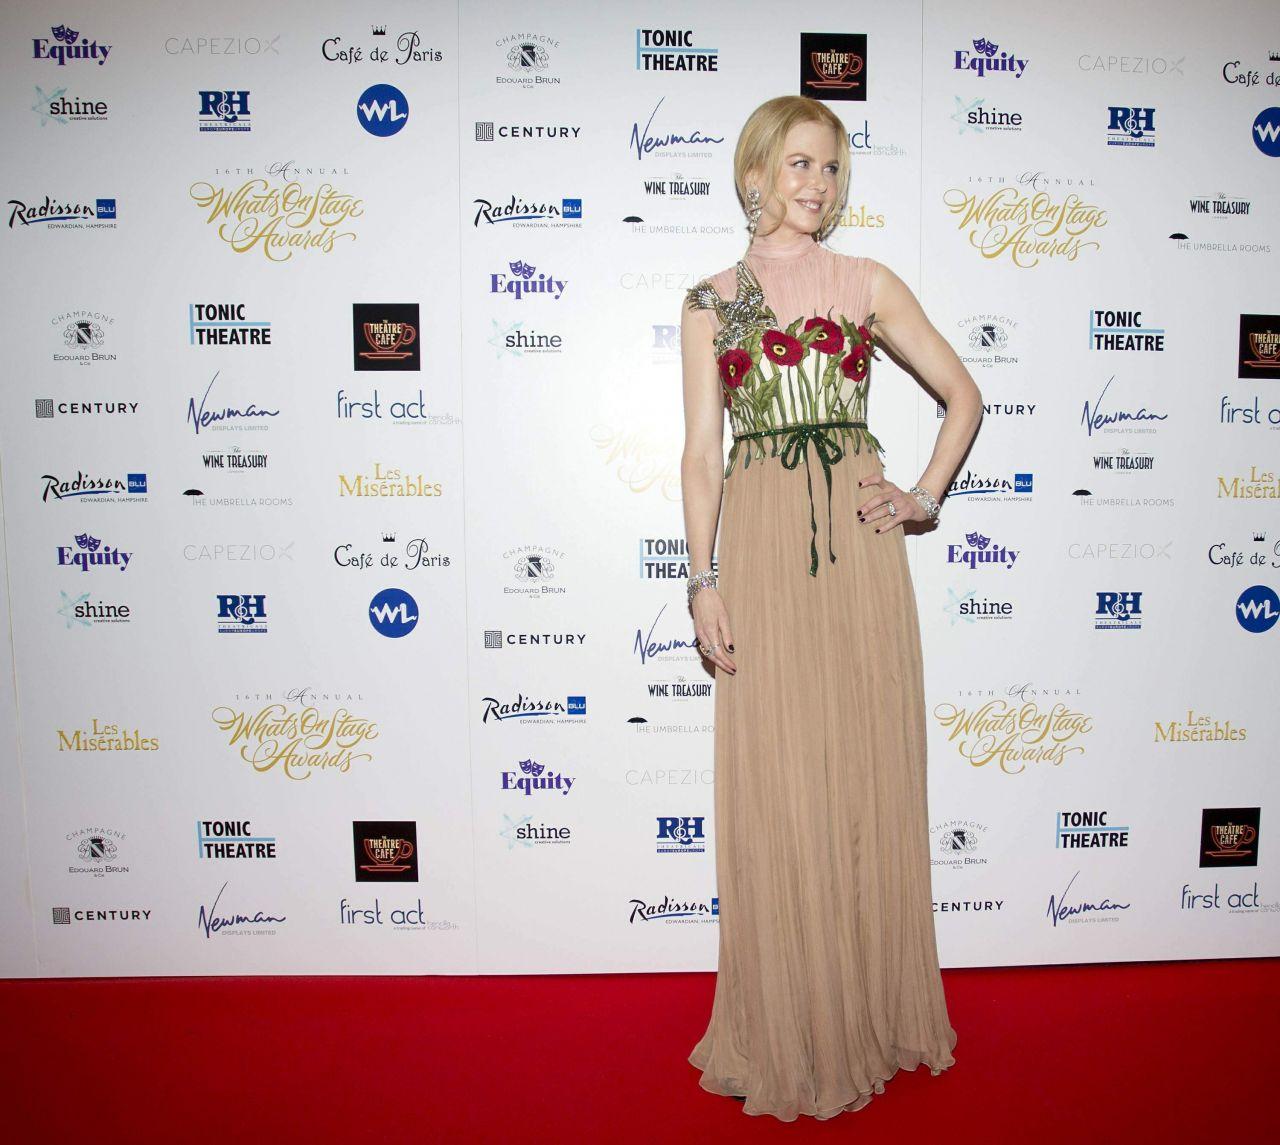 nicole-kidman-2016-whatsonstage-awards-in-london-2-21-2016-7